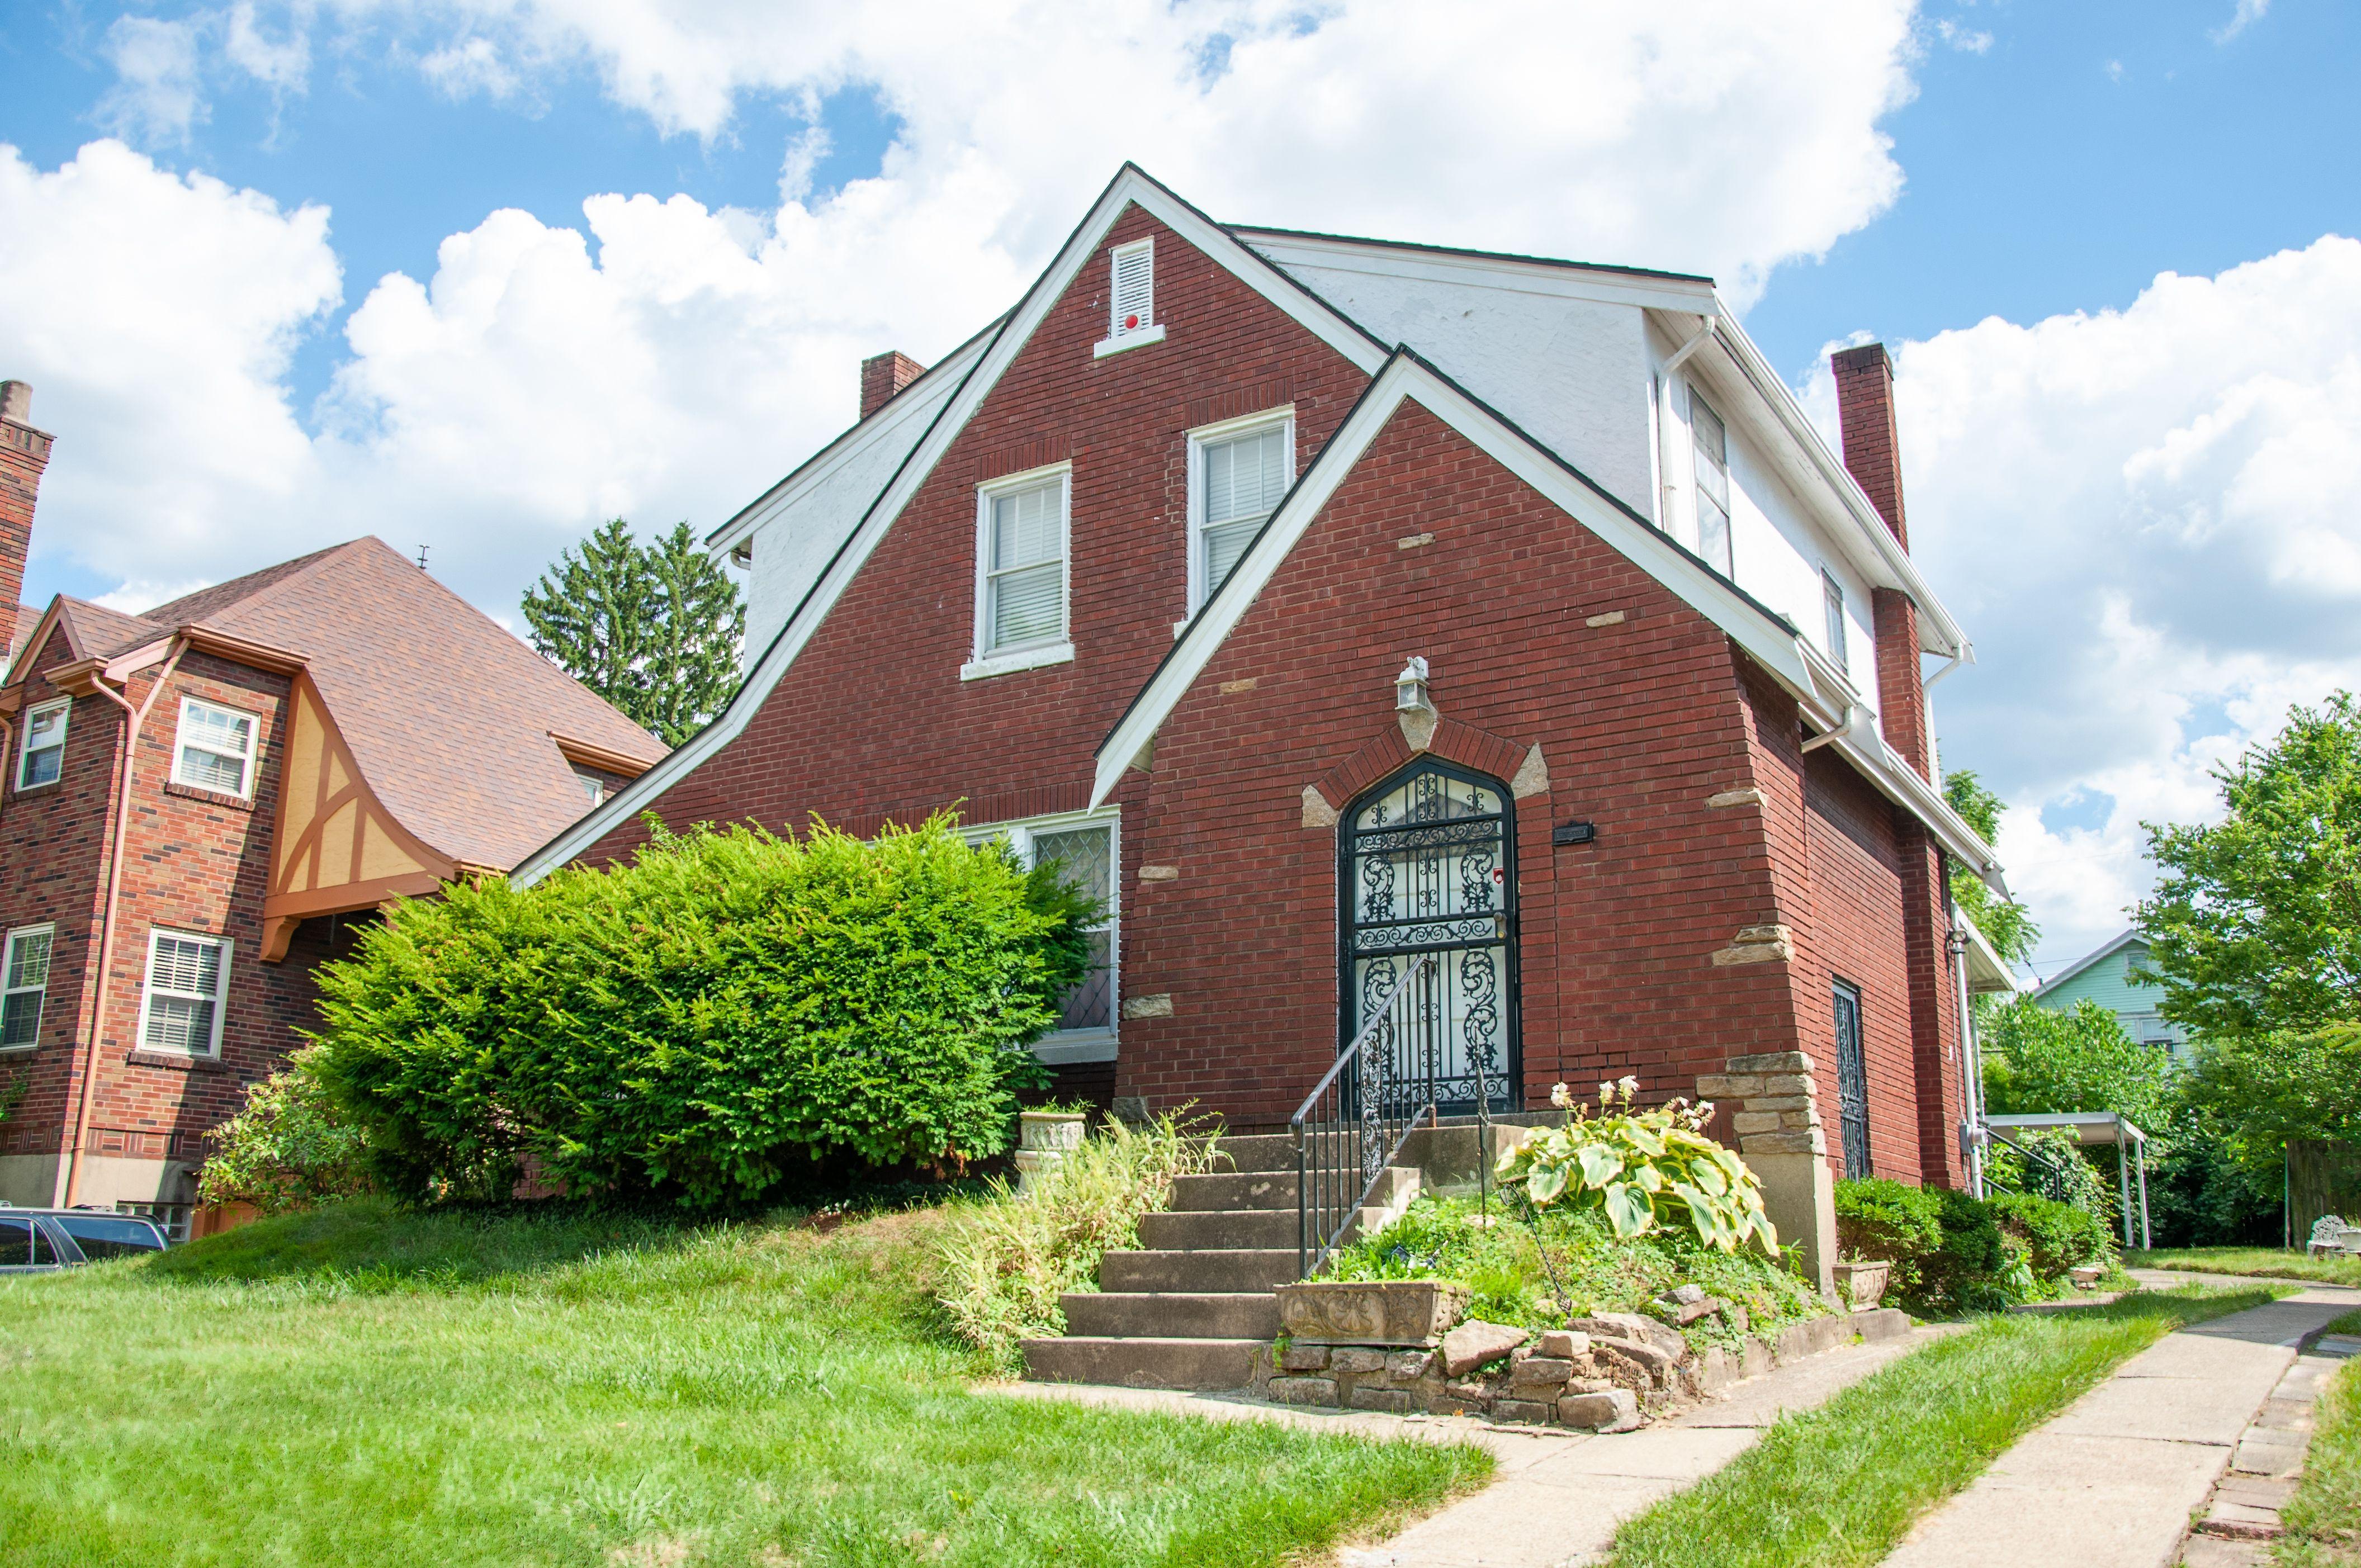 1807 Catalina Ave, Cincinnati, OH